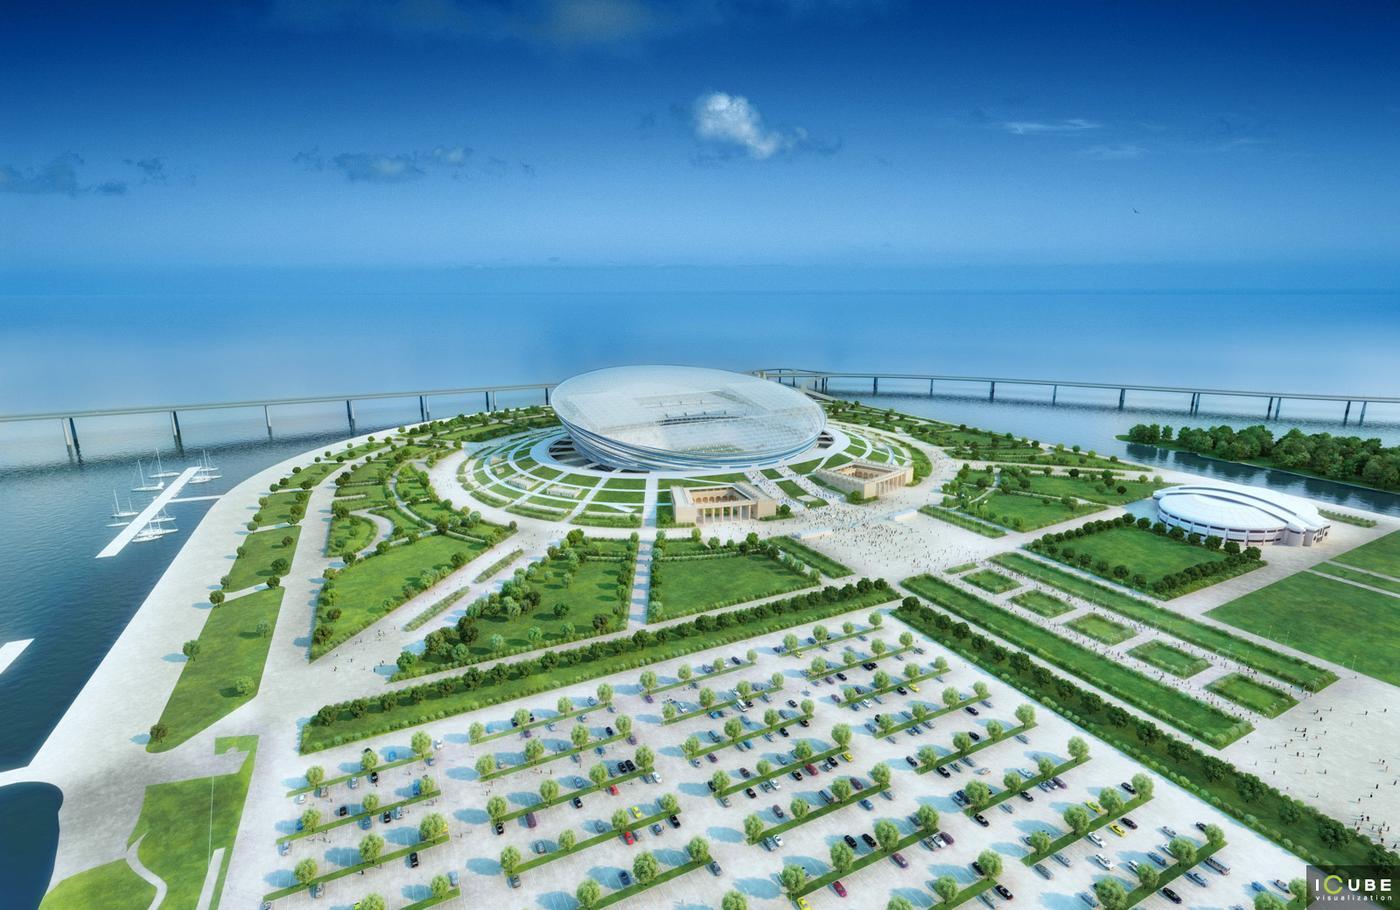 Design Stadion Zenit Stadiumdb Com